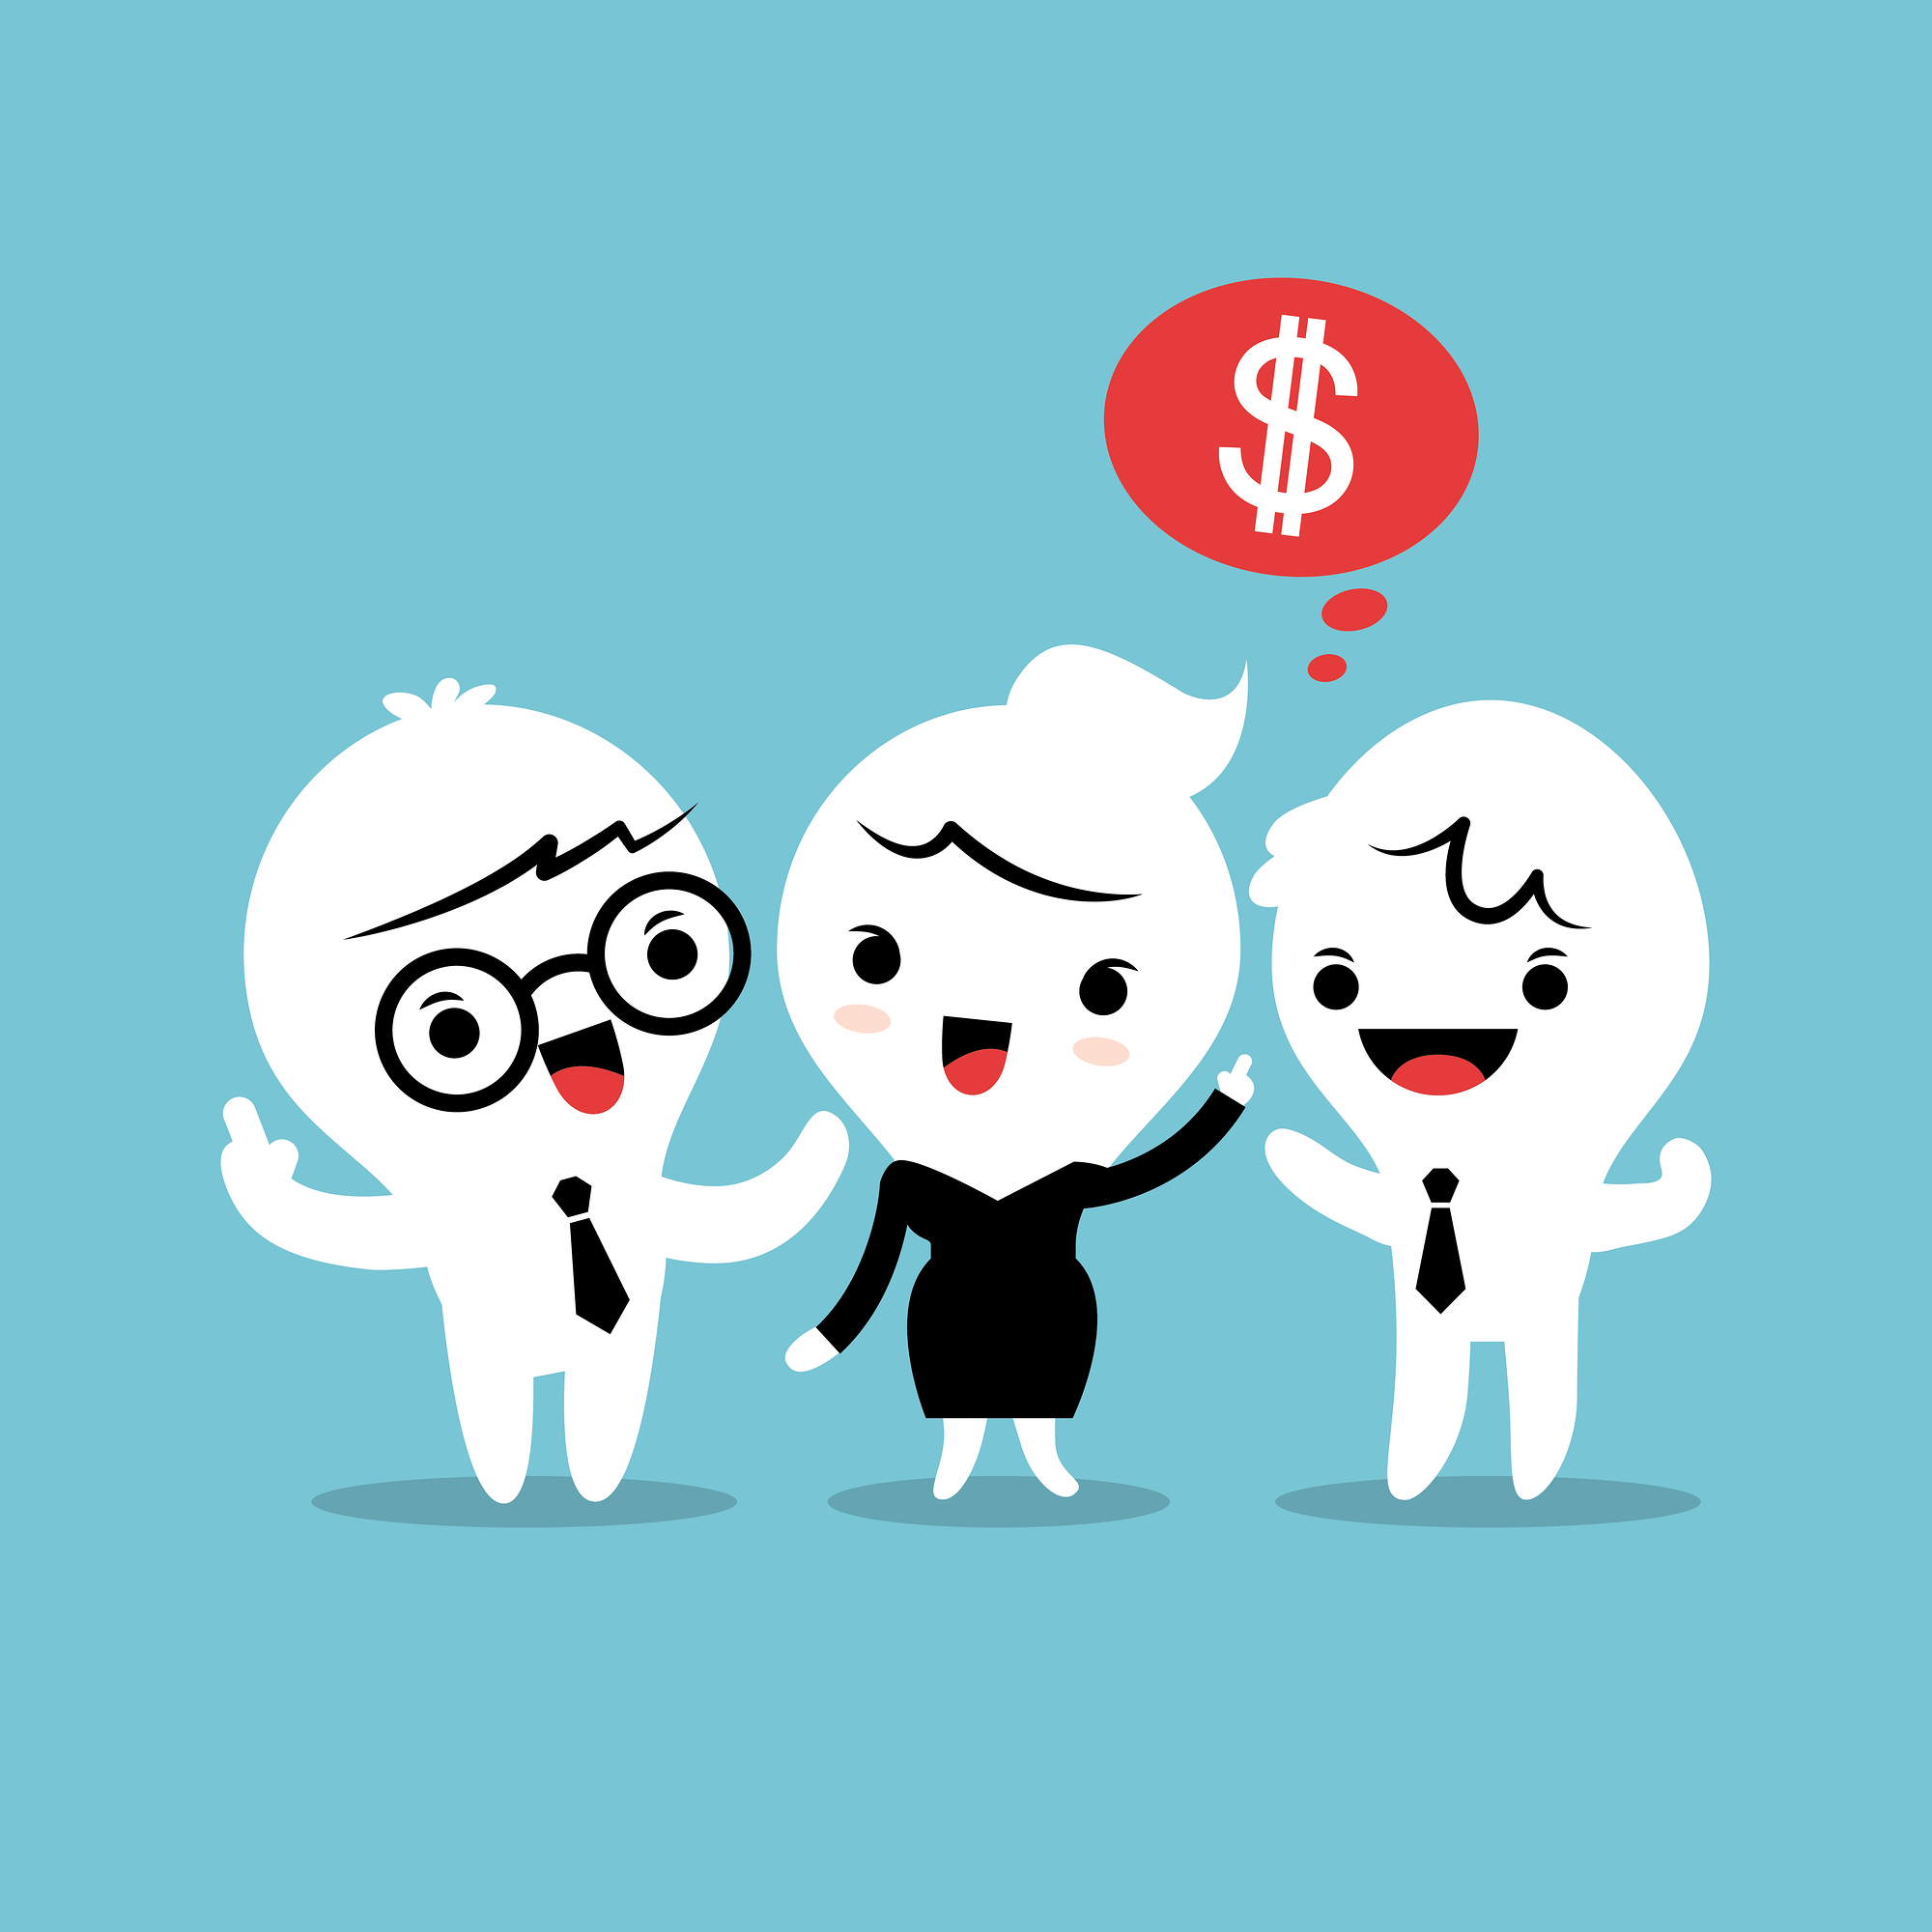 refer a friend referral cartoon concept illustration